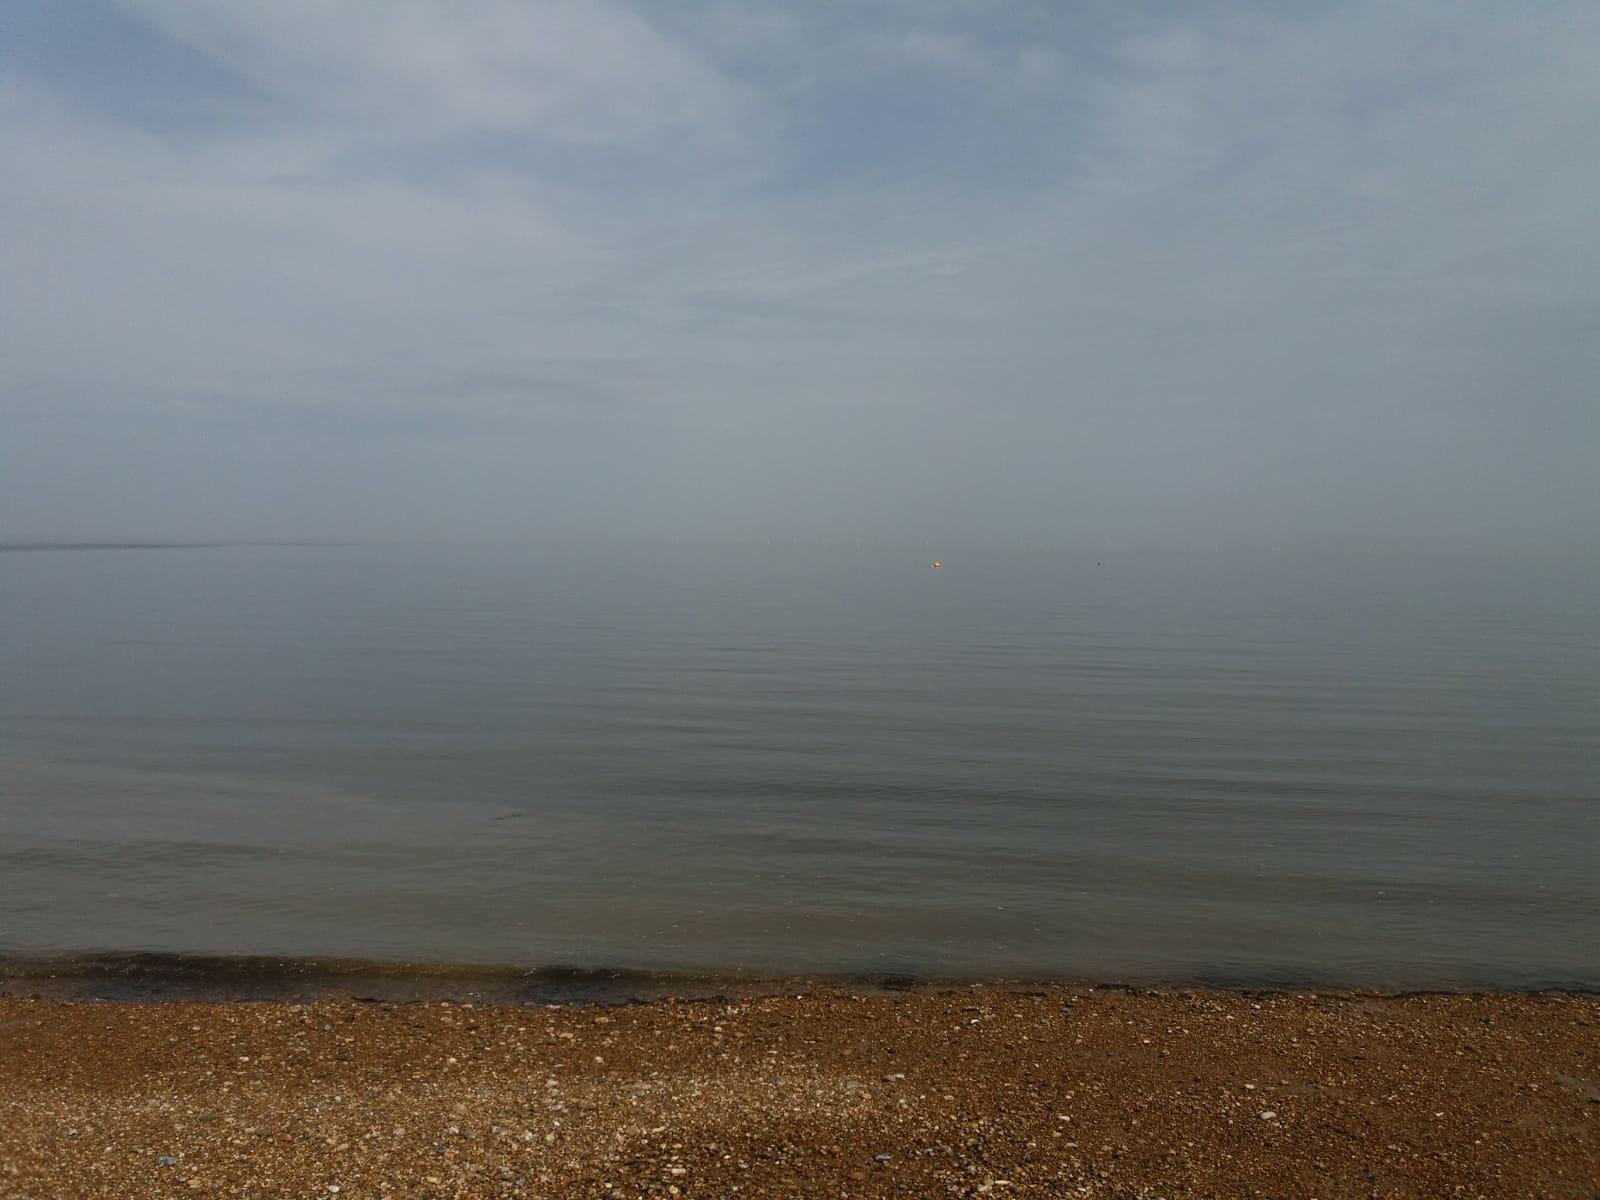 Eyes on the Whitstable Horizon